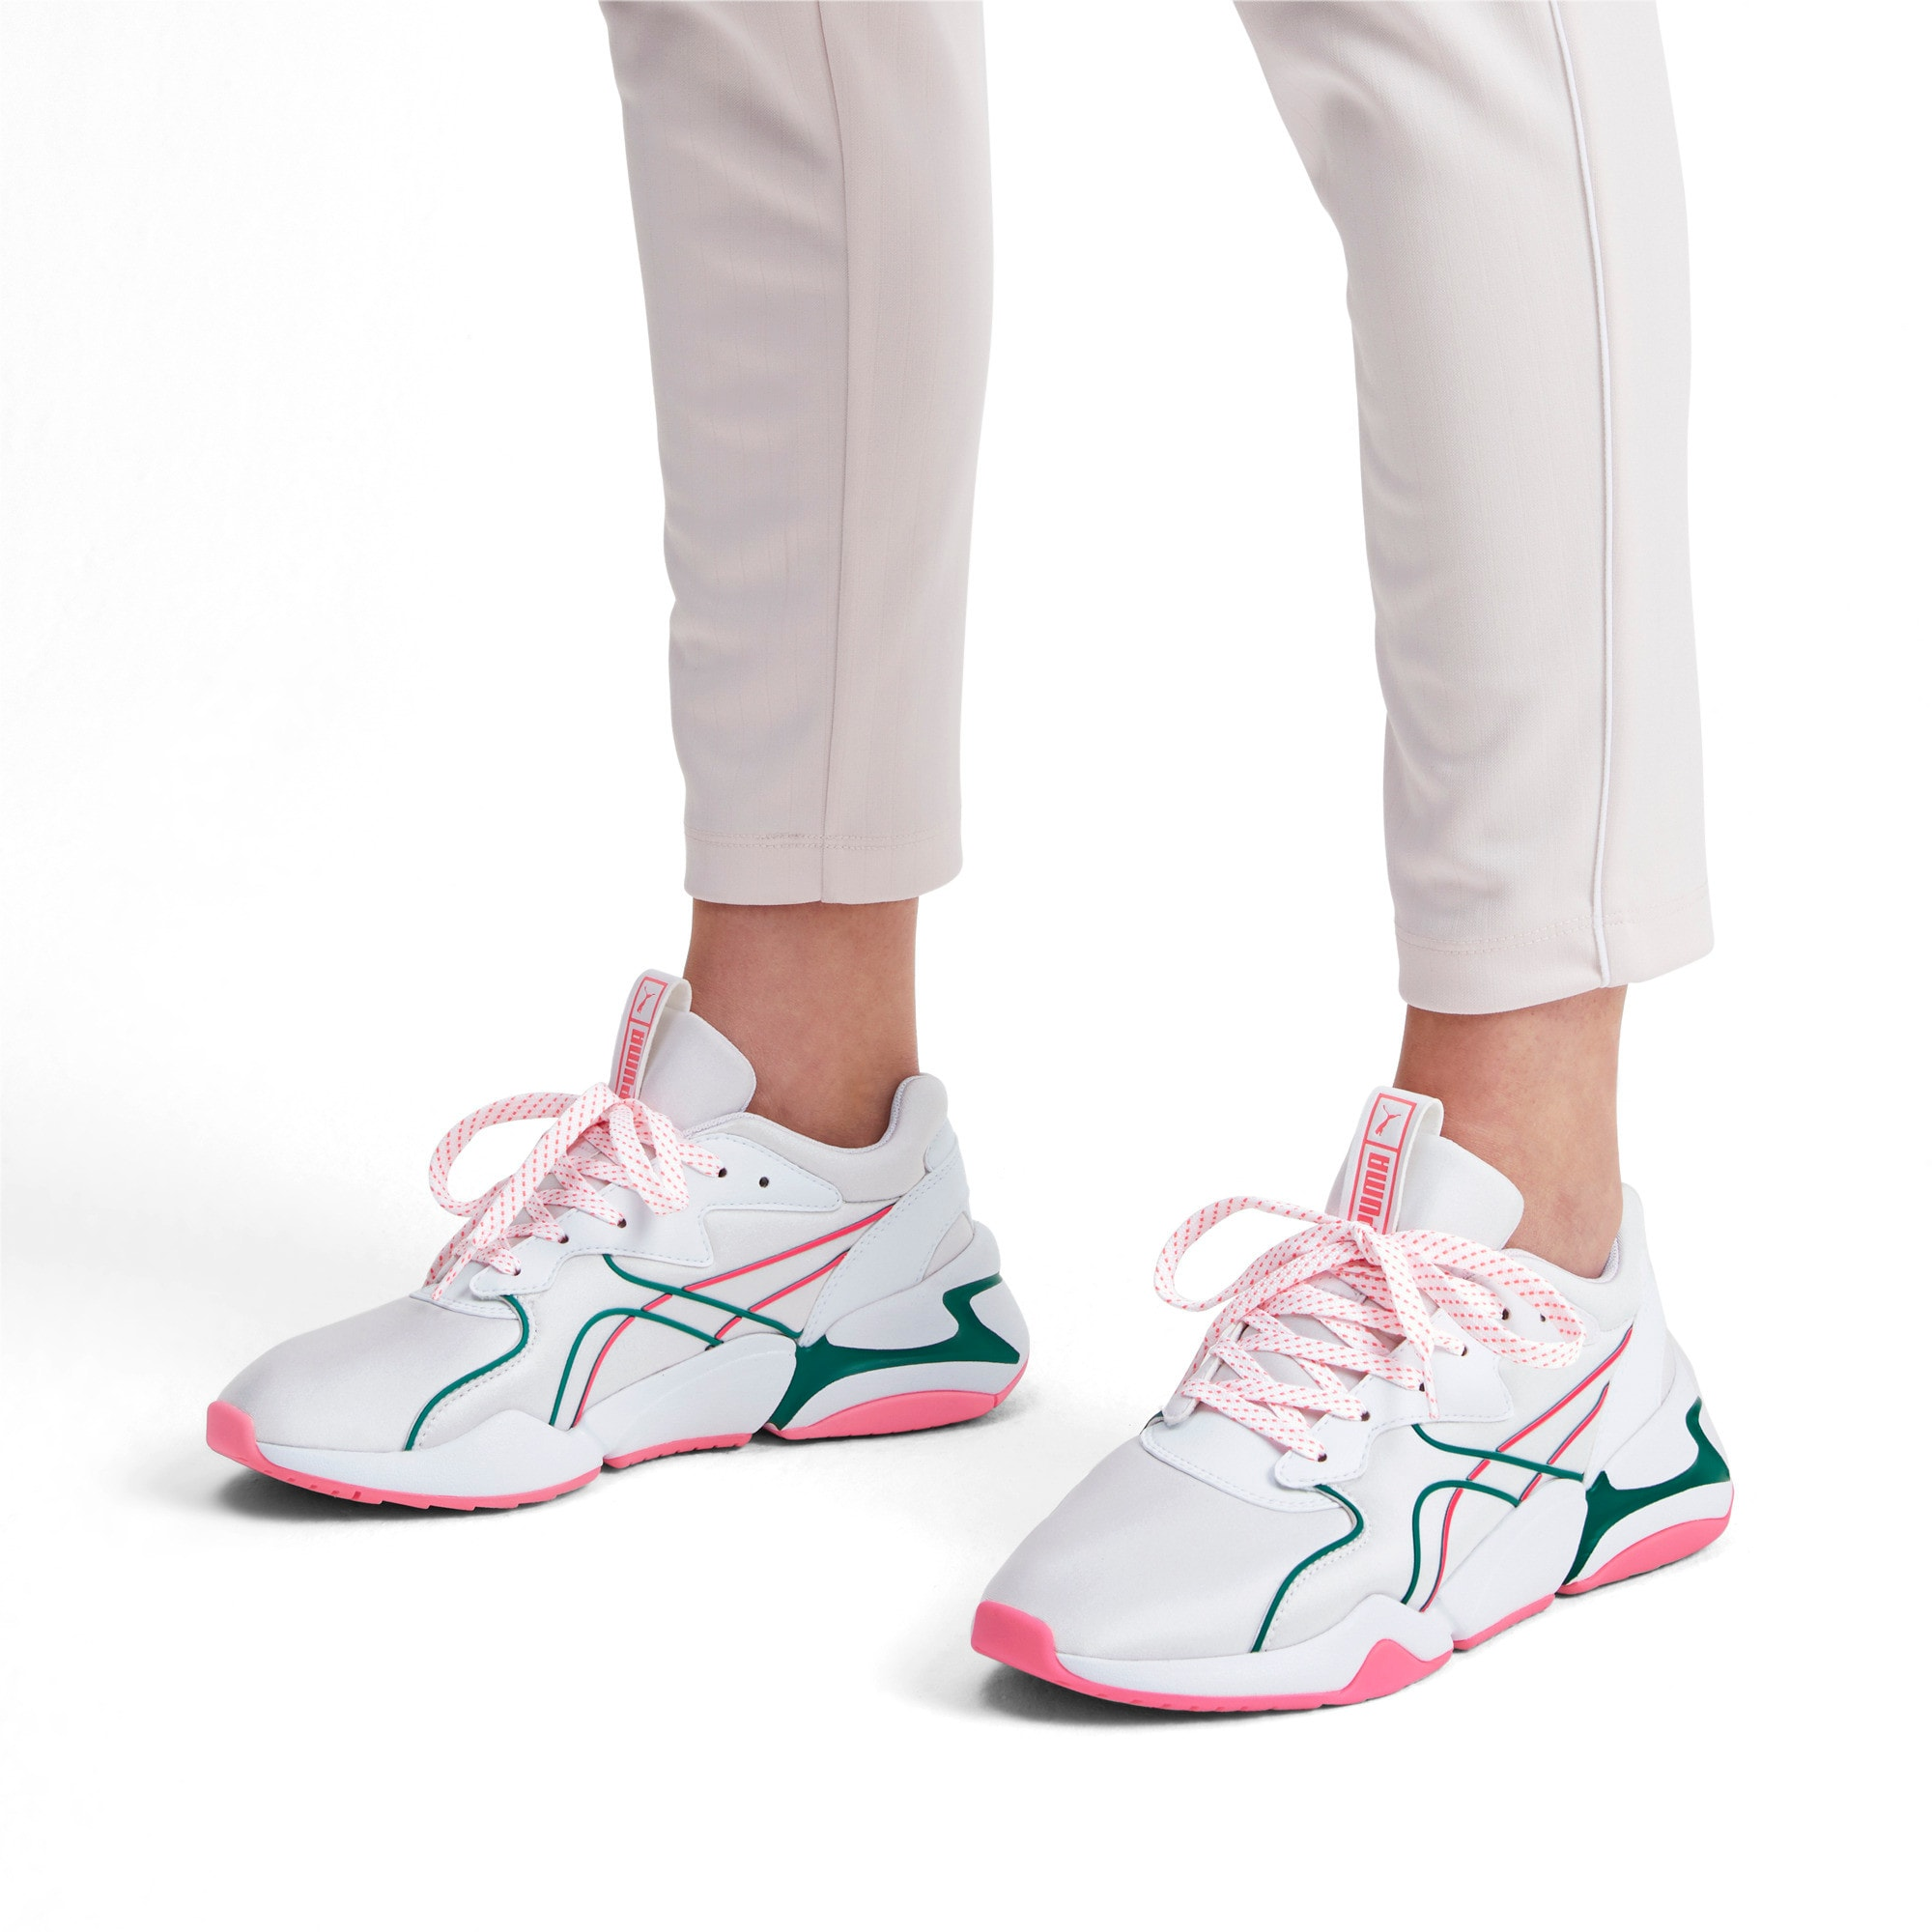 Thumbnail 2 van Nova Hypertech IMEVA - Sportschoenen voor vrouwen, Puma White, medium